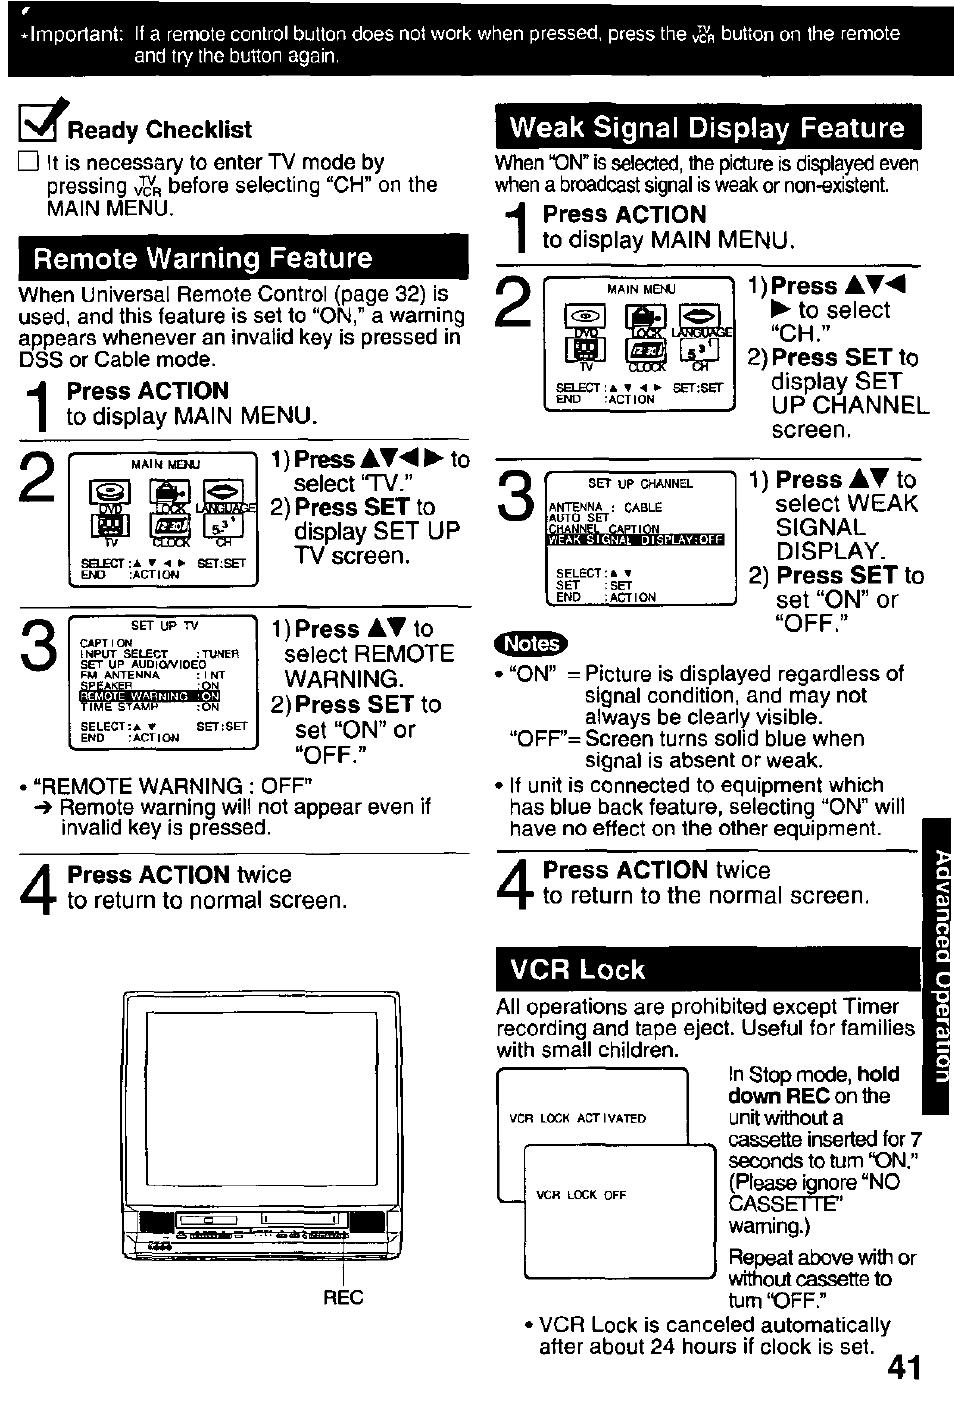 Ix^readv checklist, Remote warning feature, Press action